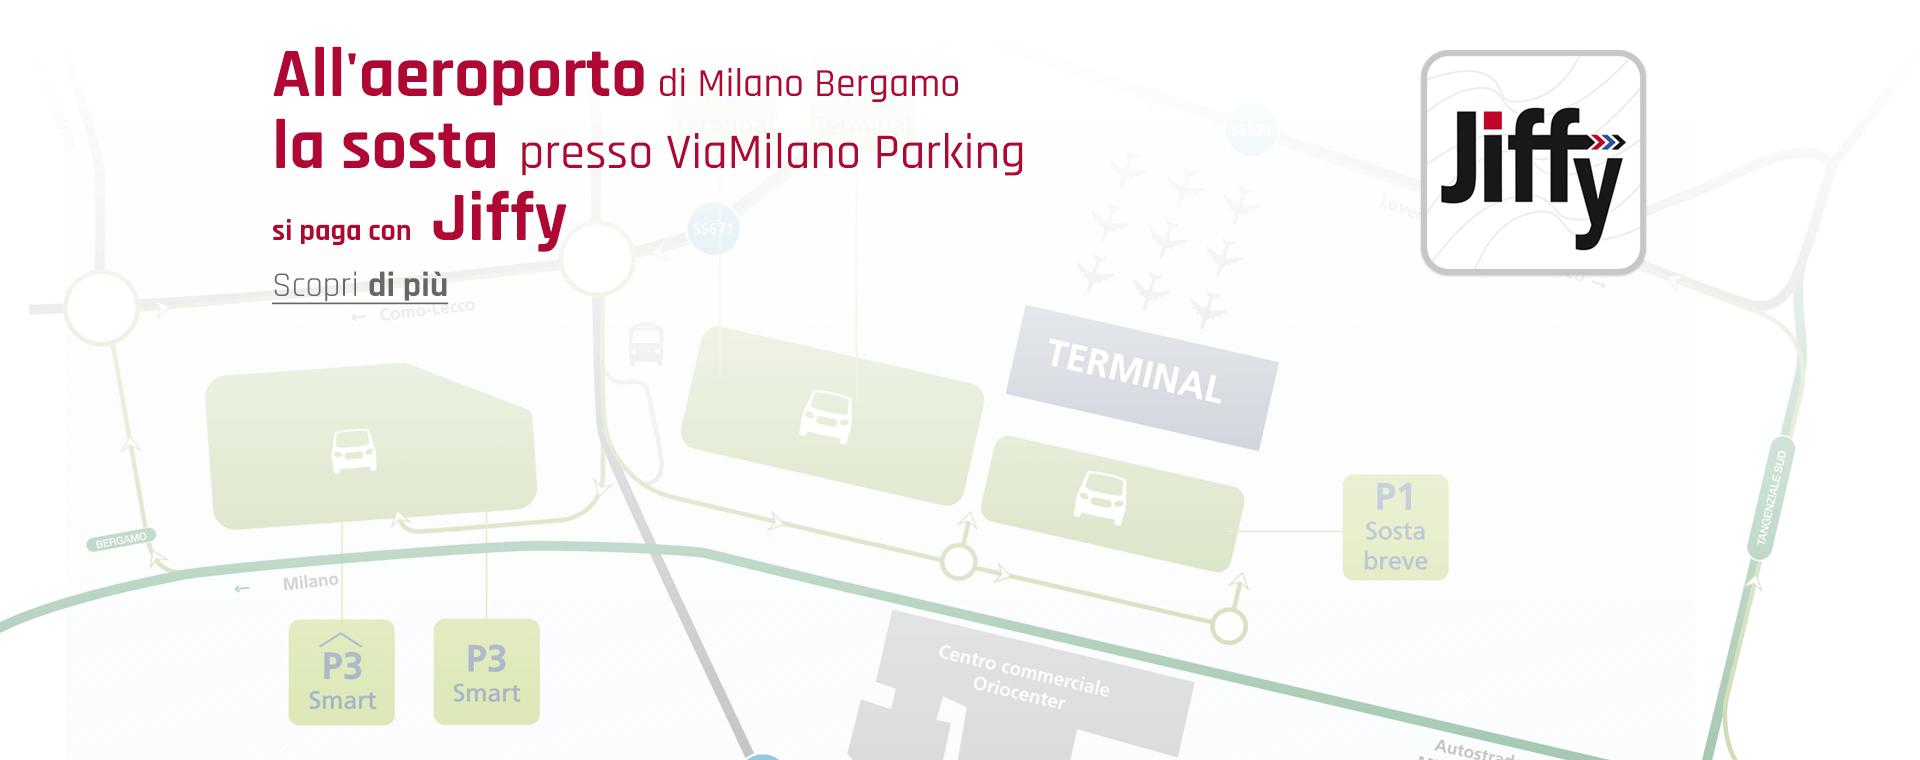 Milano Bergamo, SEA, Jiffy, ViaMilano Parking, Mobile Payment, parcheggio, aeroporto